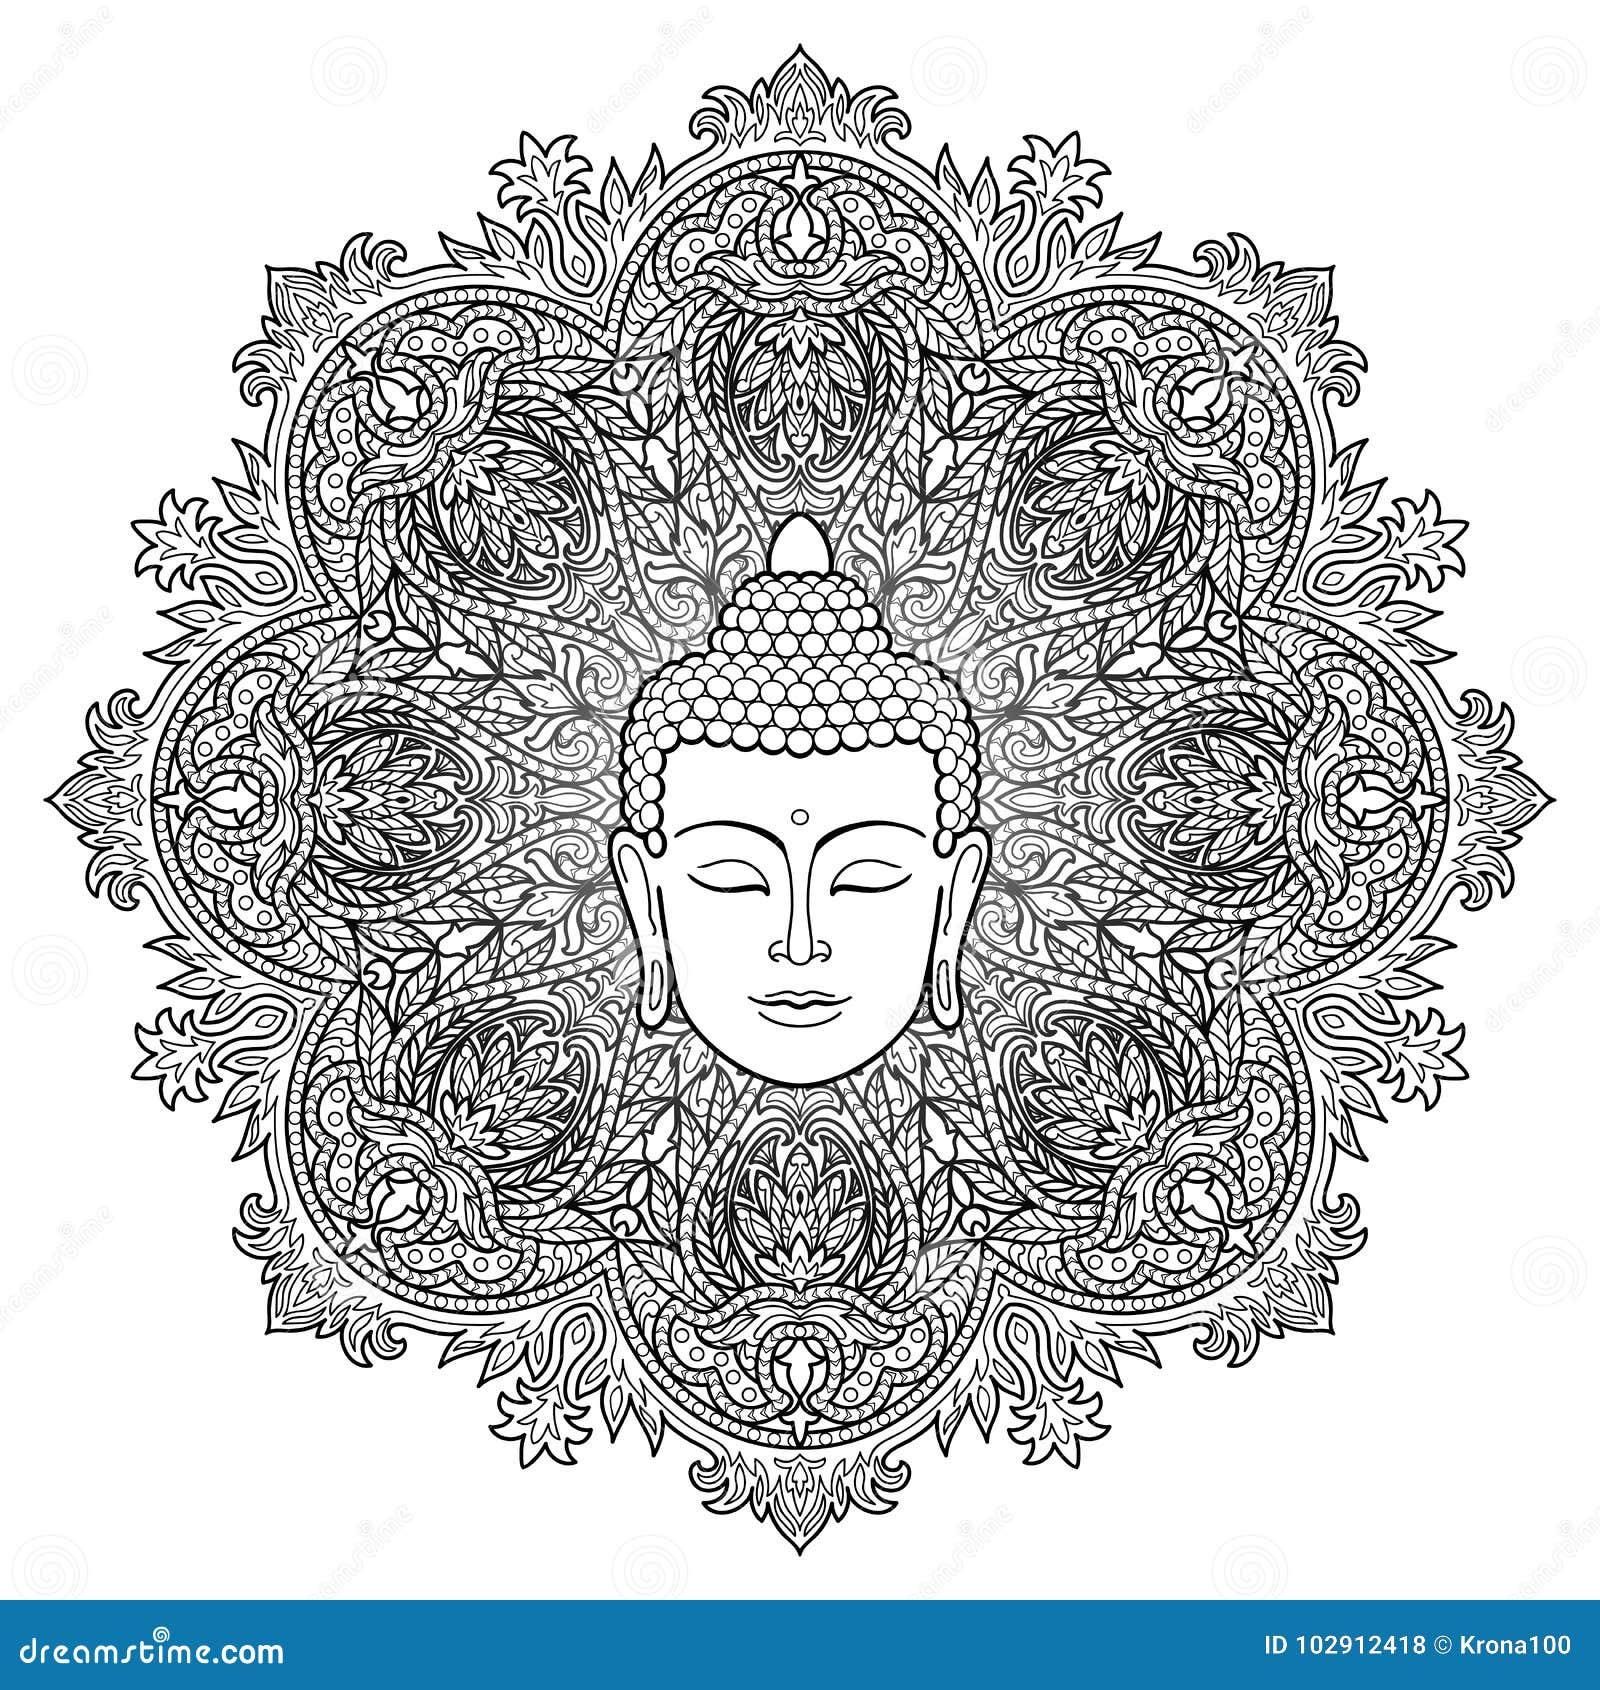 Buddha Mandala Coloring Page Stock Vector - Illustration of black ...